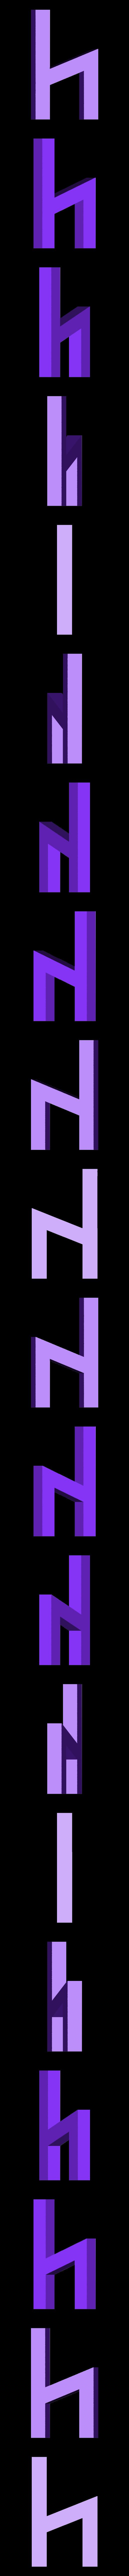 WakandaFont-X.stl Download free STL file Wakandan Font • Model to 3D print, hterefenko